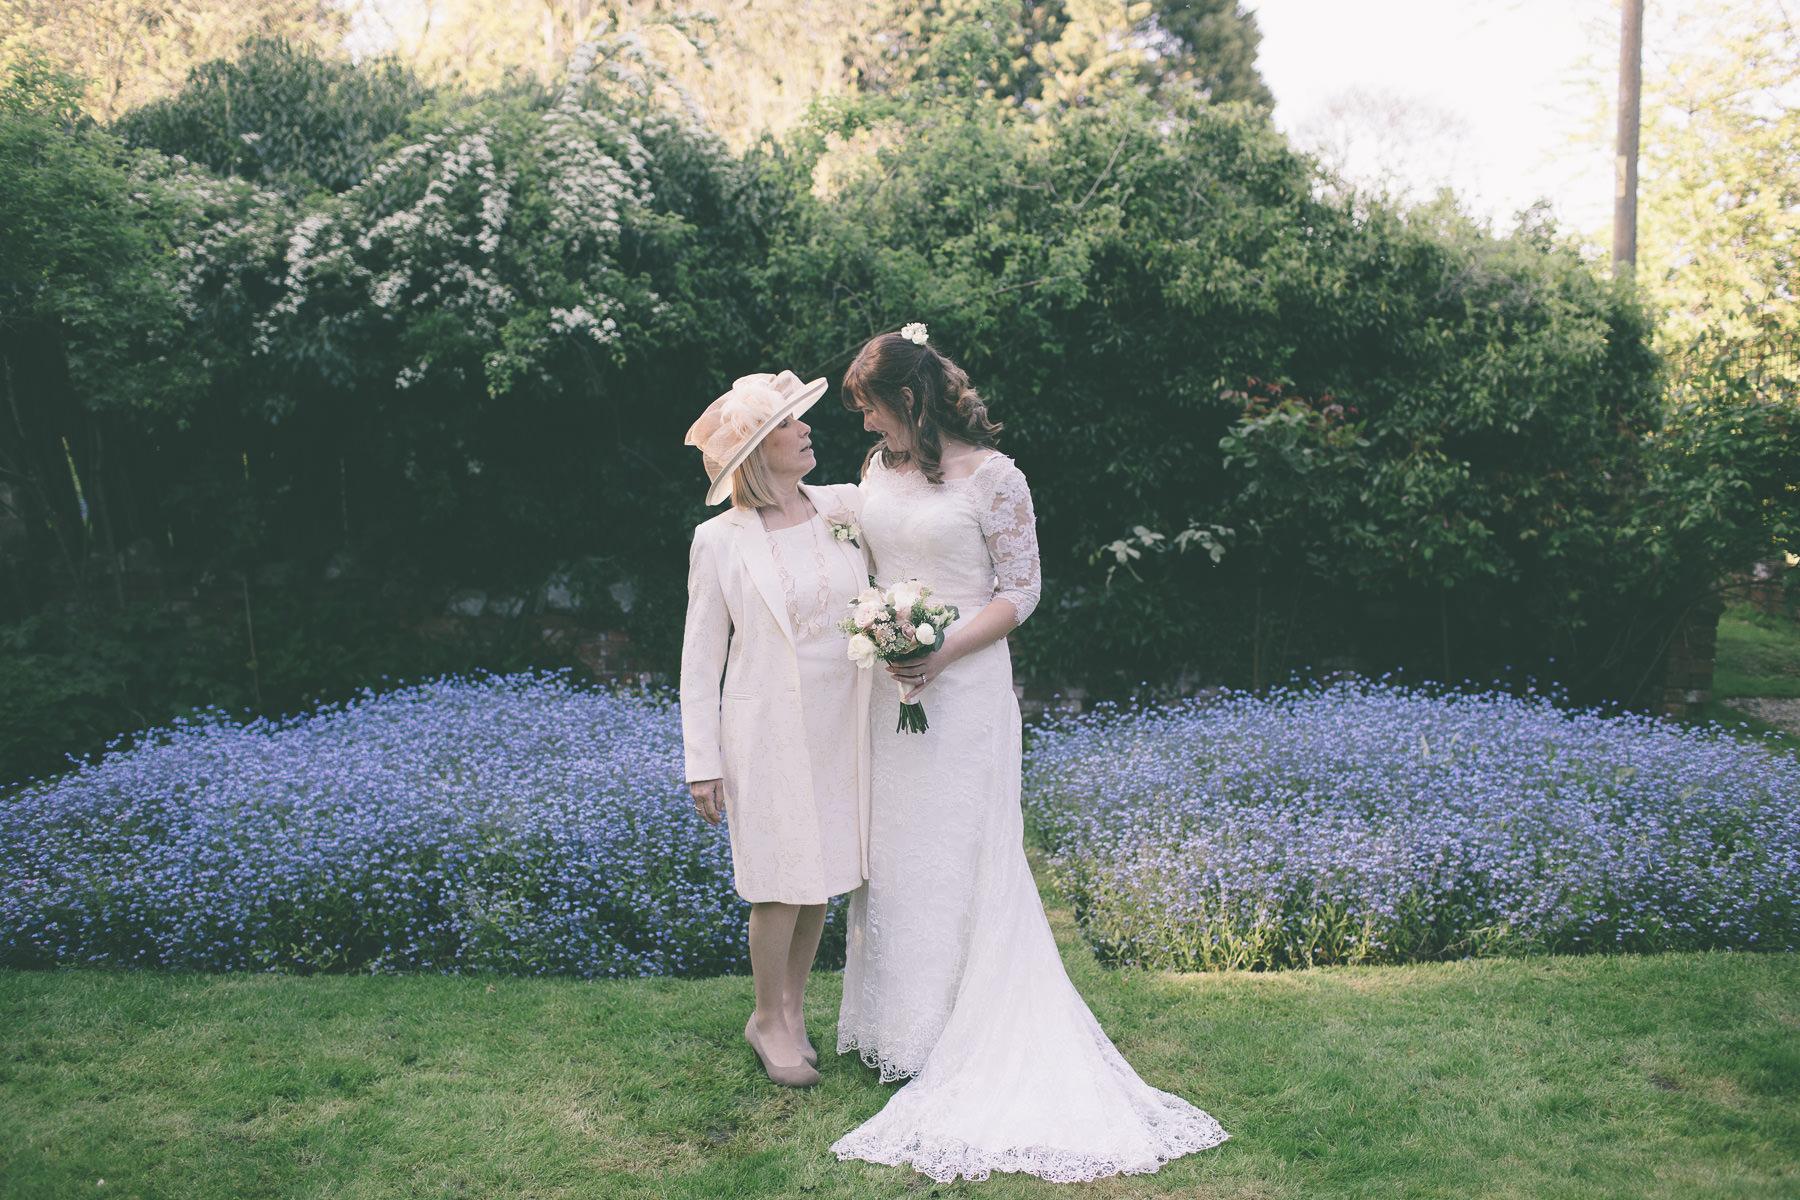 Pamber-Place-wedding-photography-basingstoke-hampshire-180